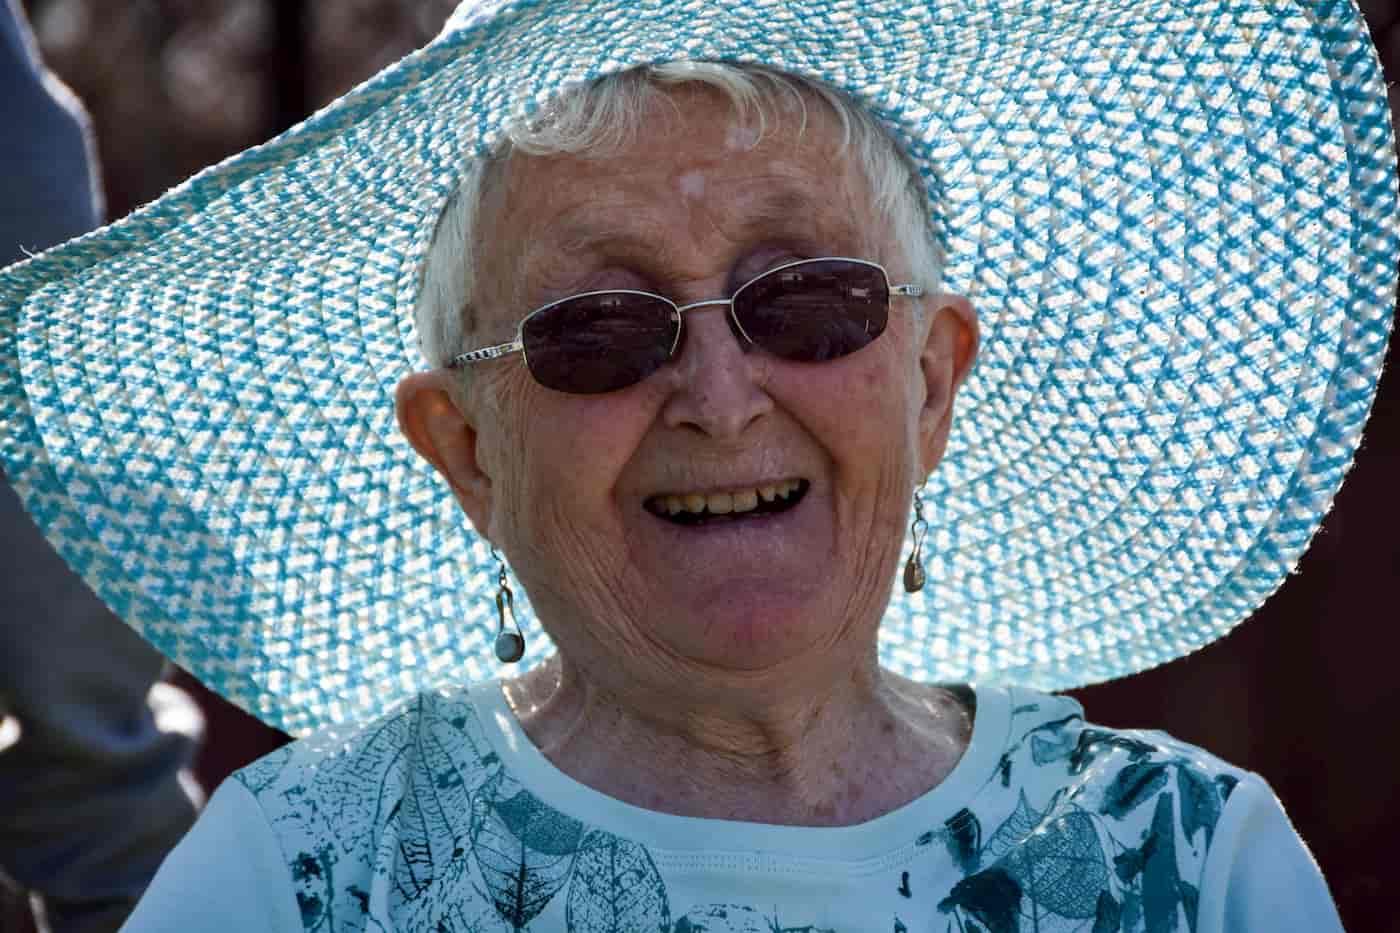 Older Women wearing a sun hat for sun safety